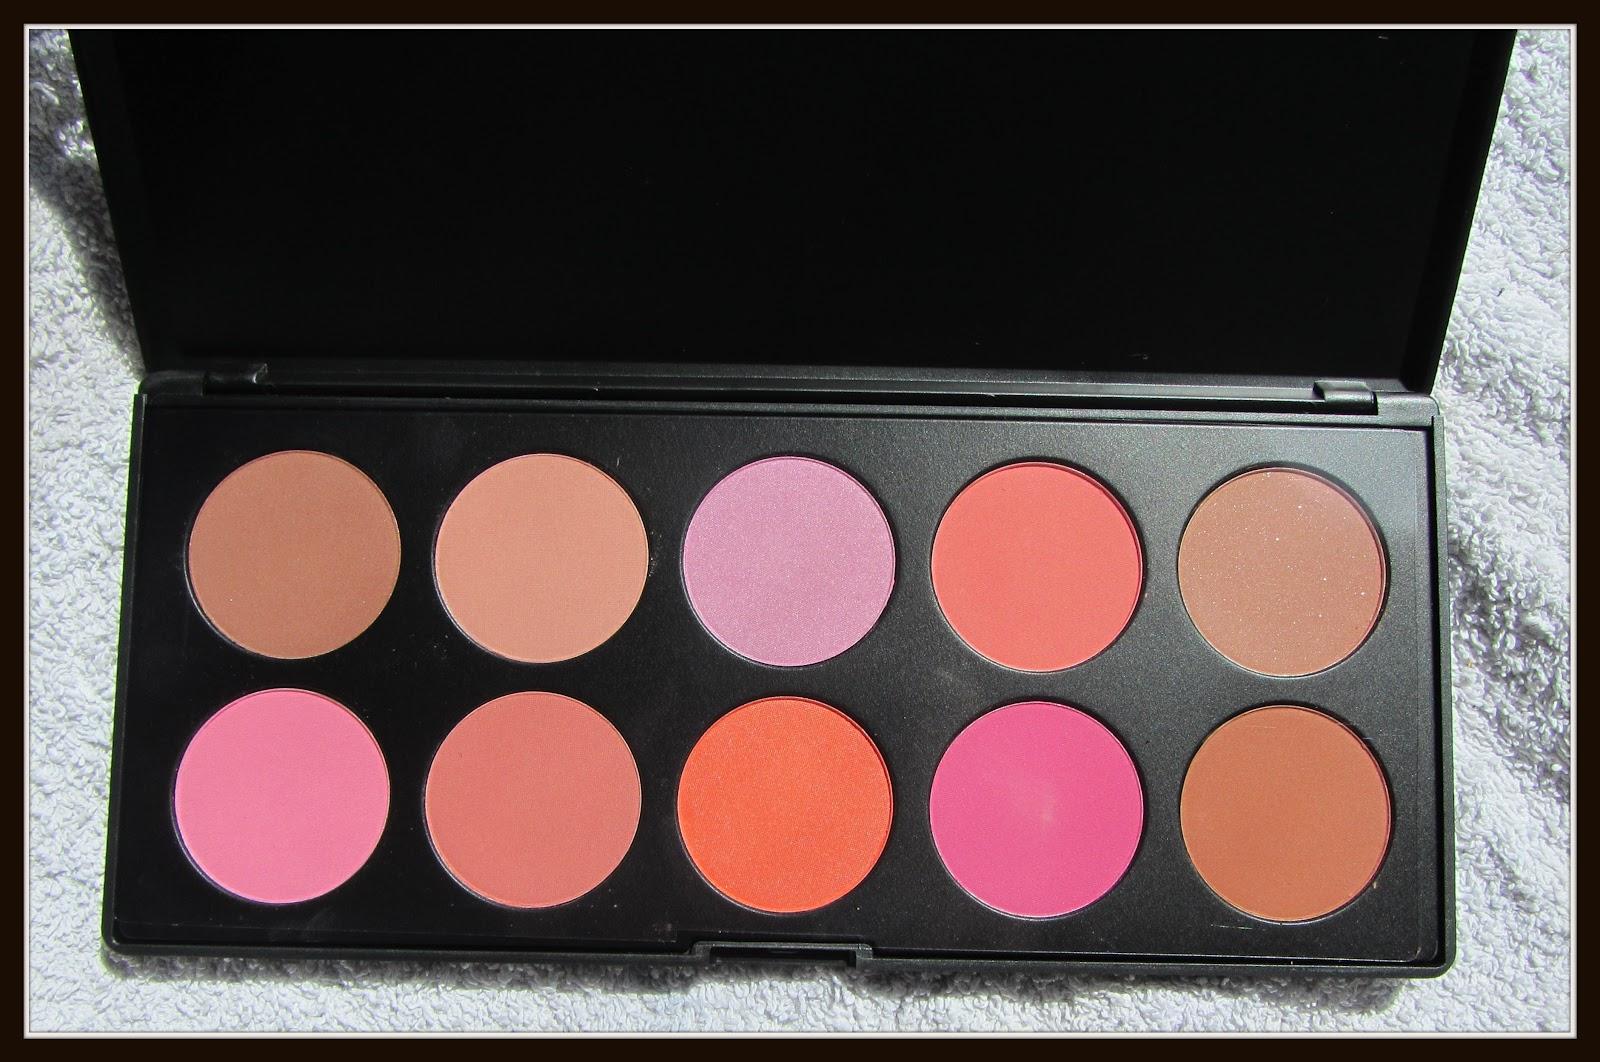 BH Cosmetics Nude Blush 10 Color Palette Delightful Beauty